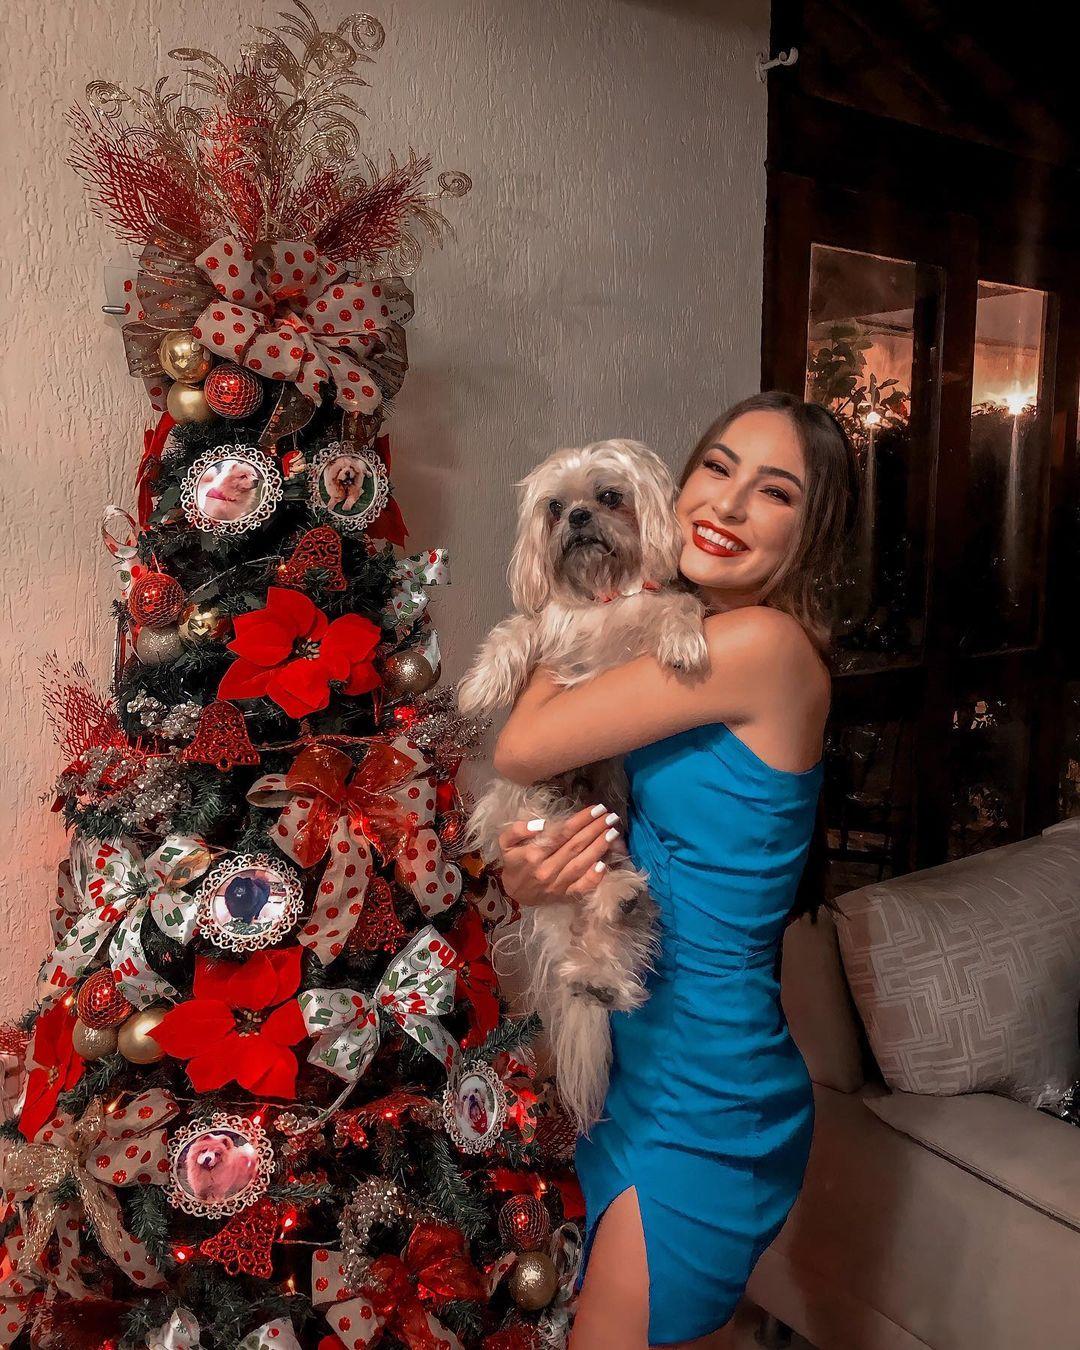 anne karoline lisboa, miss simpatia de miss brasil mundo 2019. 13211711